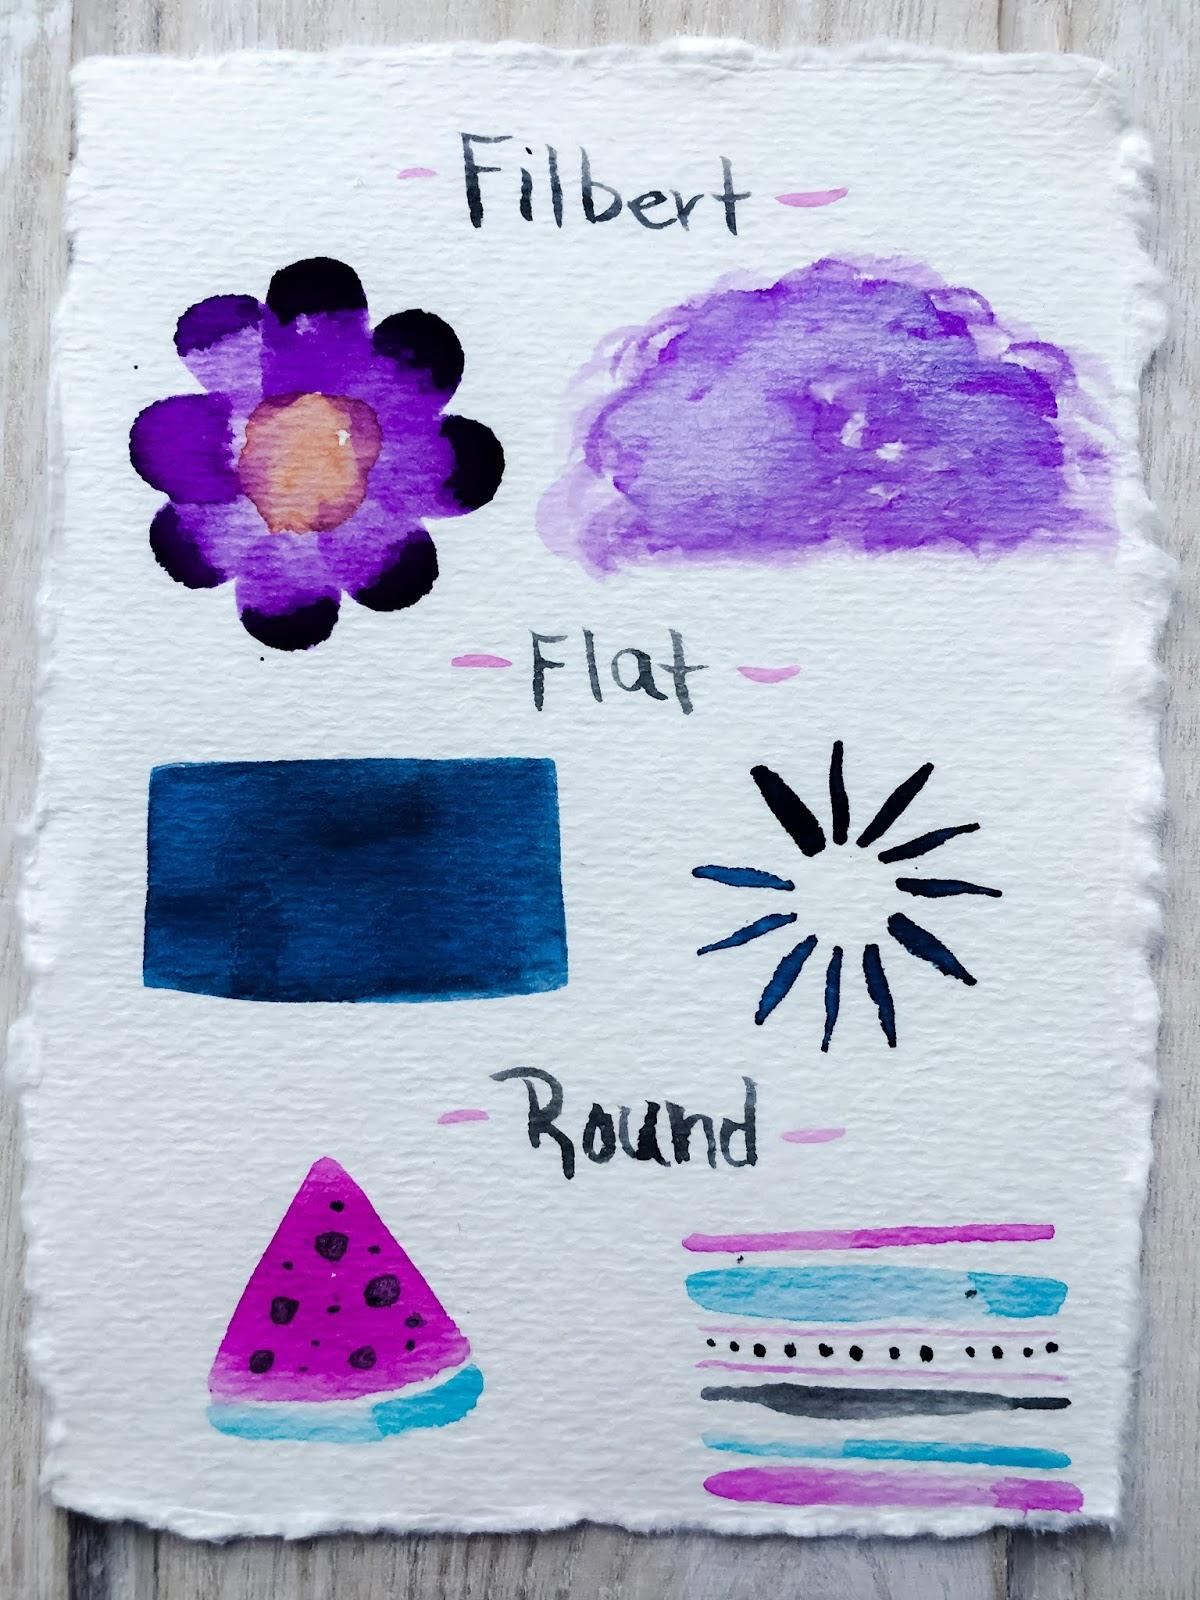 Brush Marks - Brushes - Watercolor Brushes - Watercolor Tips - Art Blog - theartsyboho.com